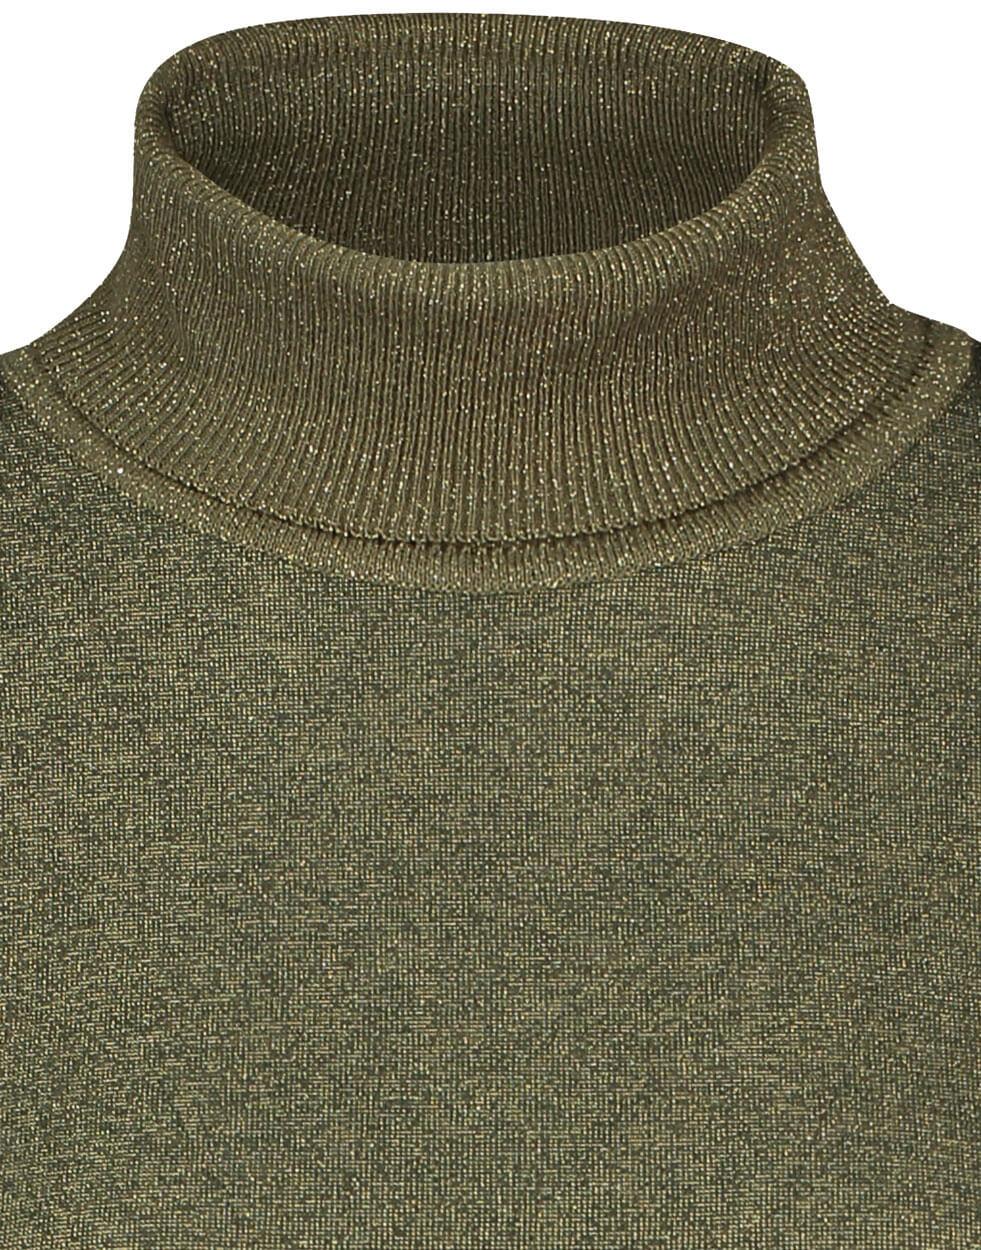 Jane Lushka Dames Josh shirt Groen